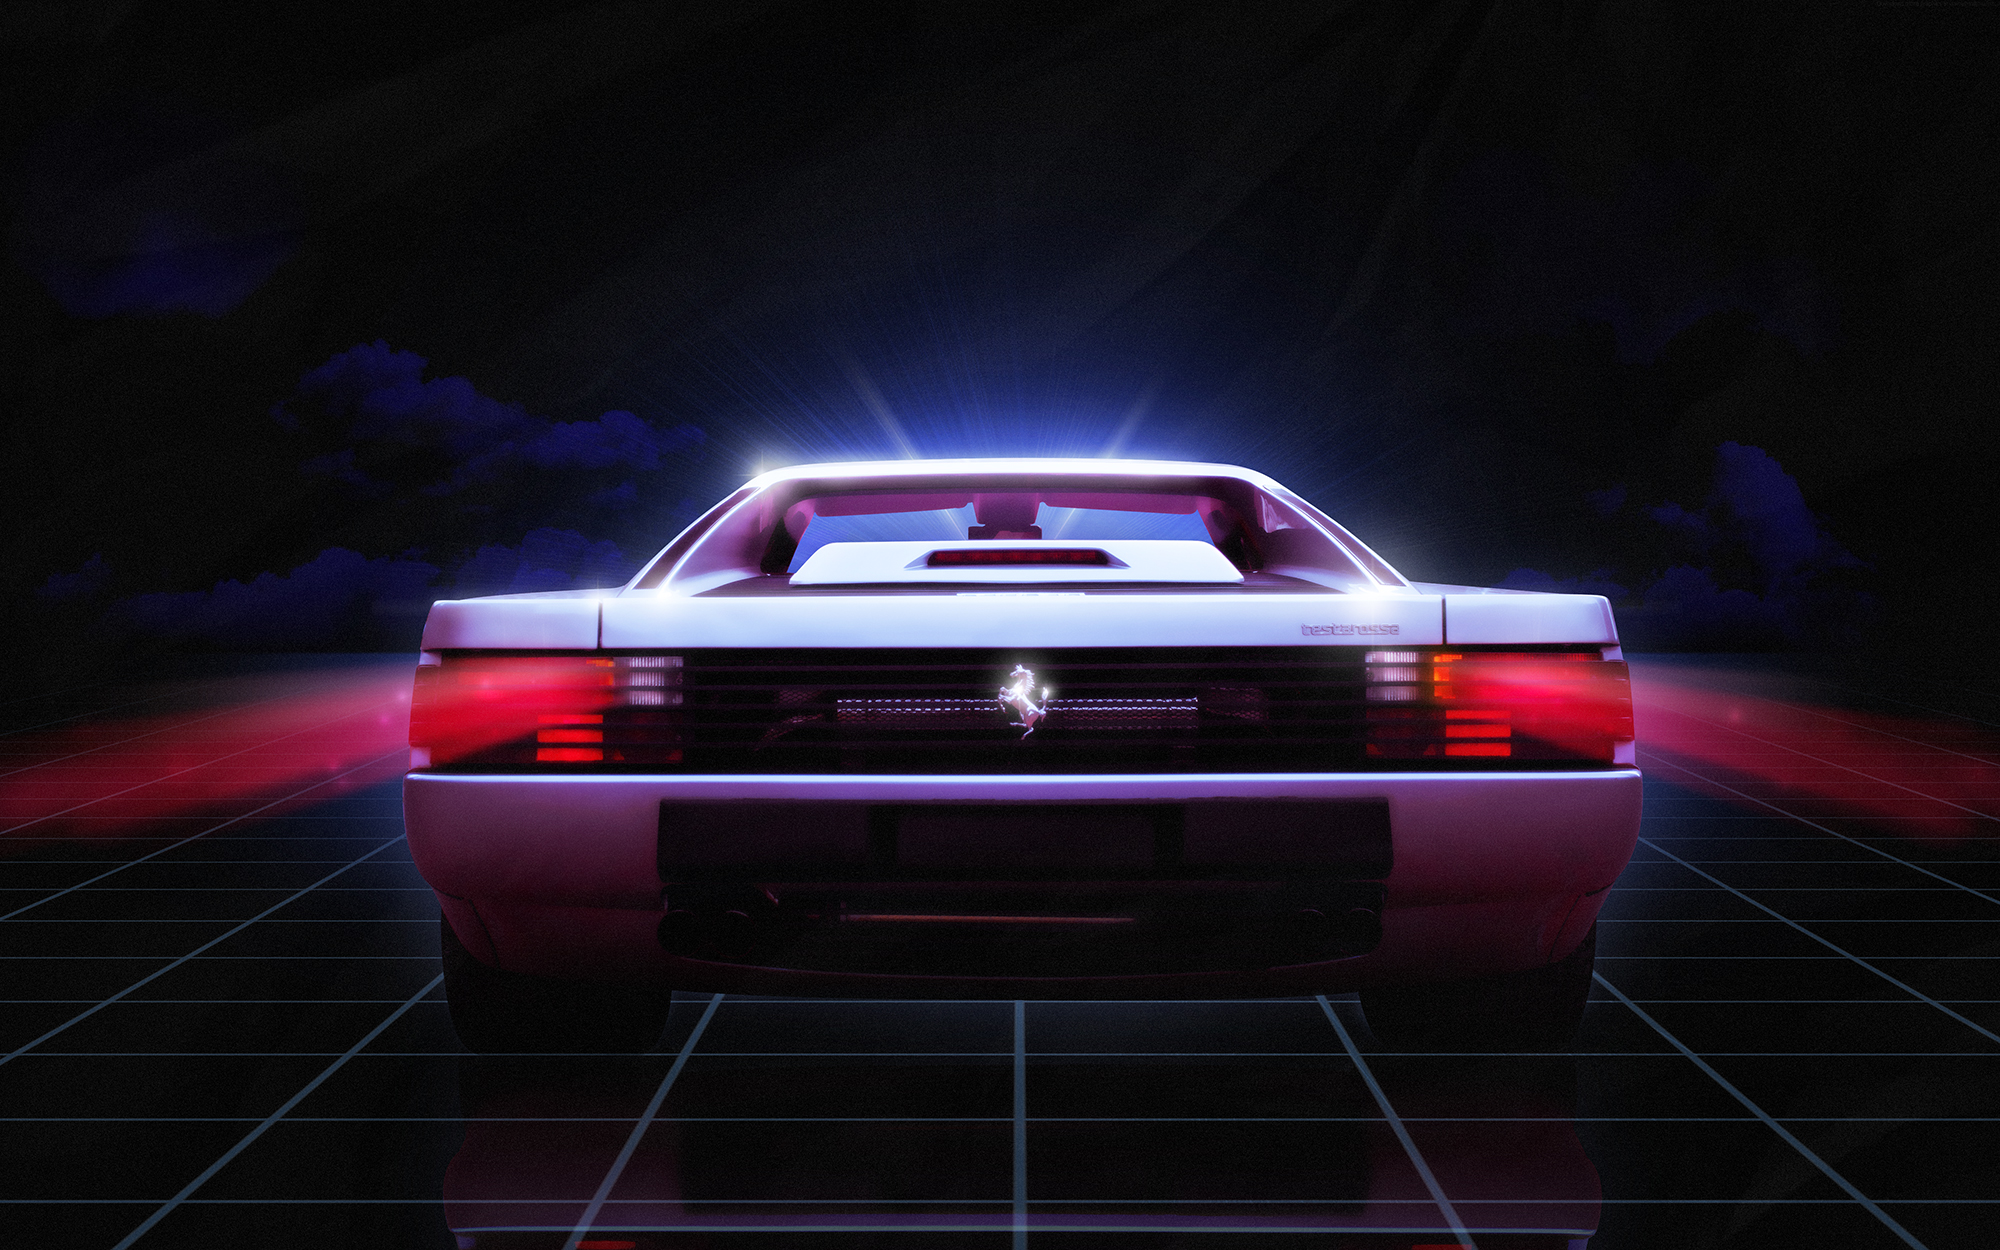 2019 Art of the Automobile Hero Car